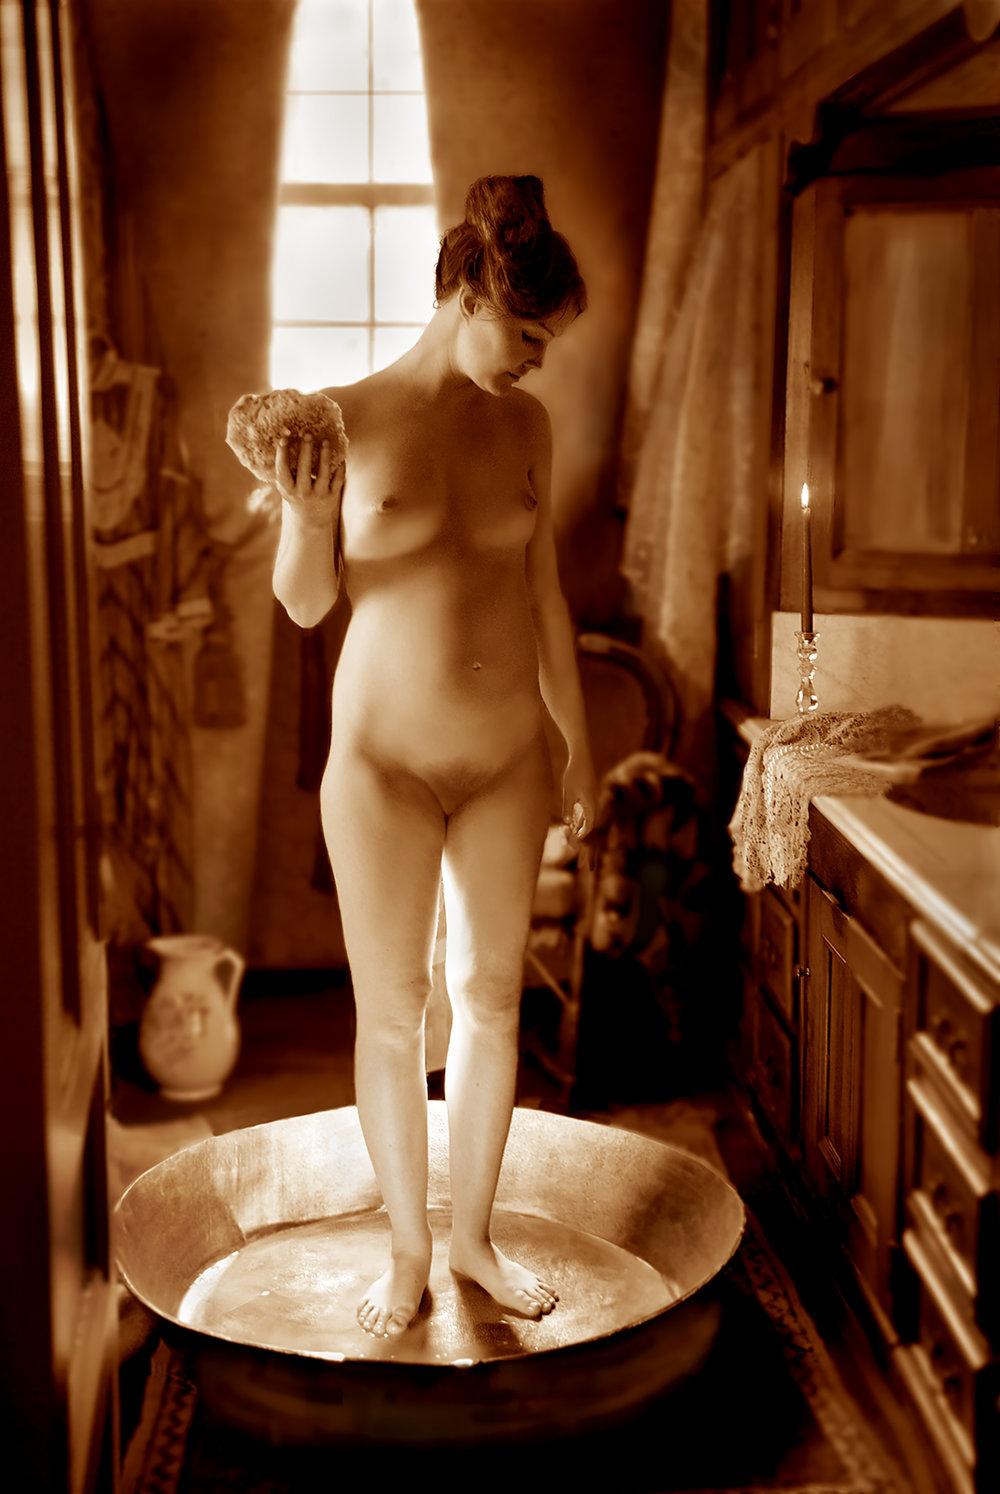 MACKENZIE STANDING, BATH PAN